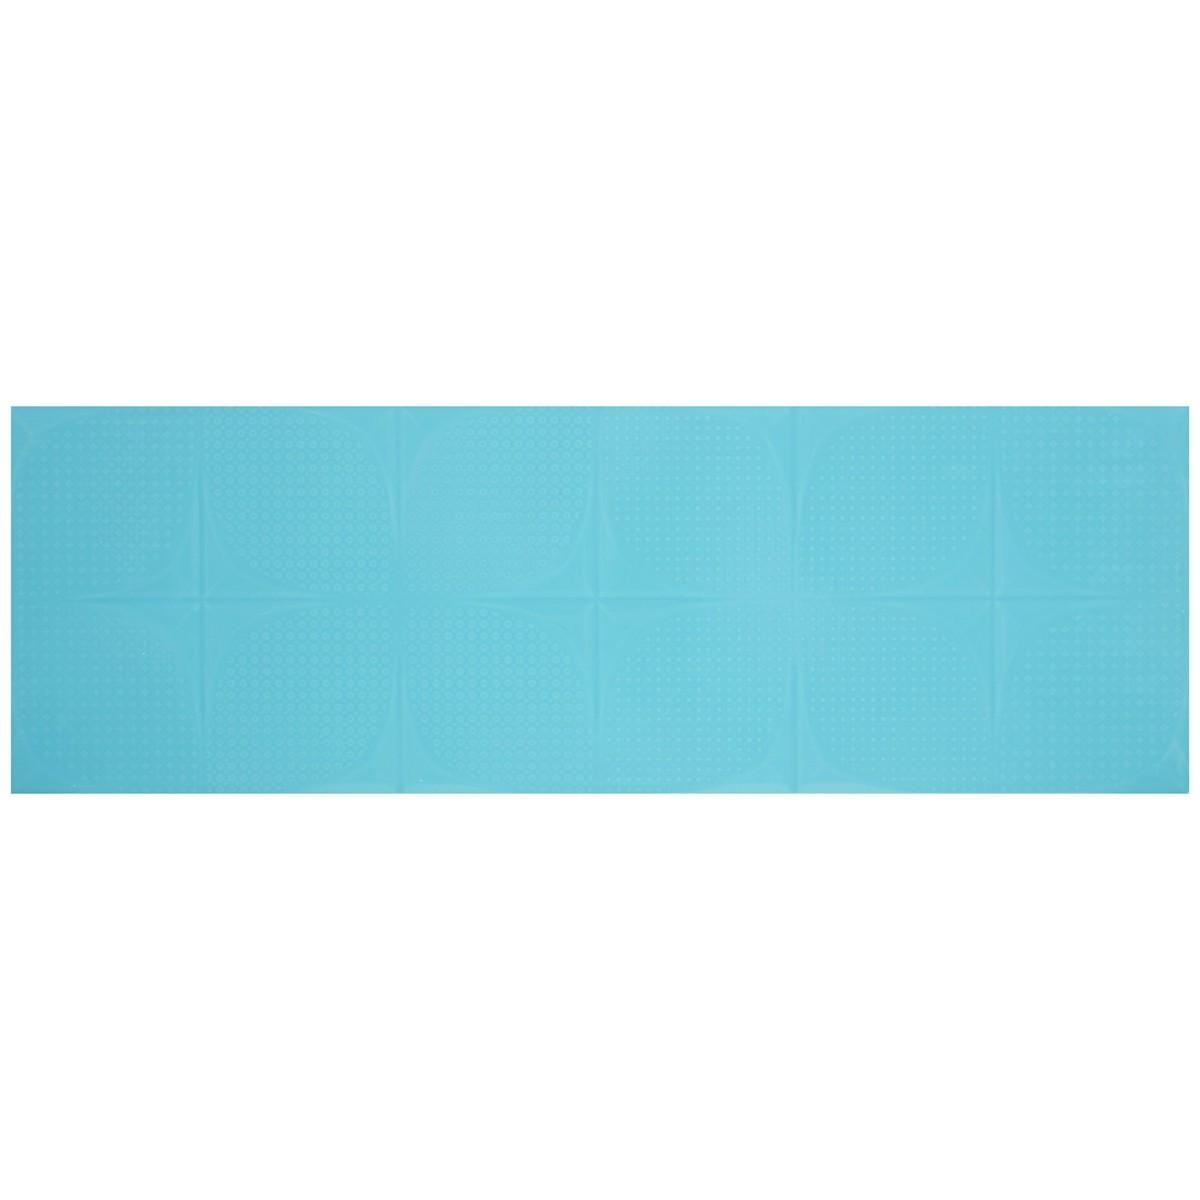 Декор Aqua «Agua Marina» 25х75 см 1.31 м2